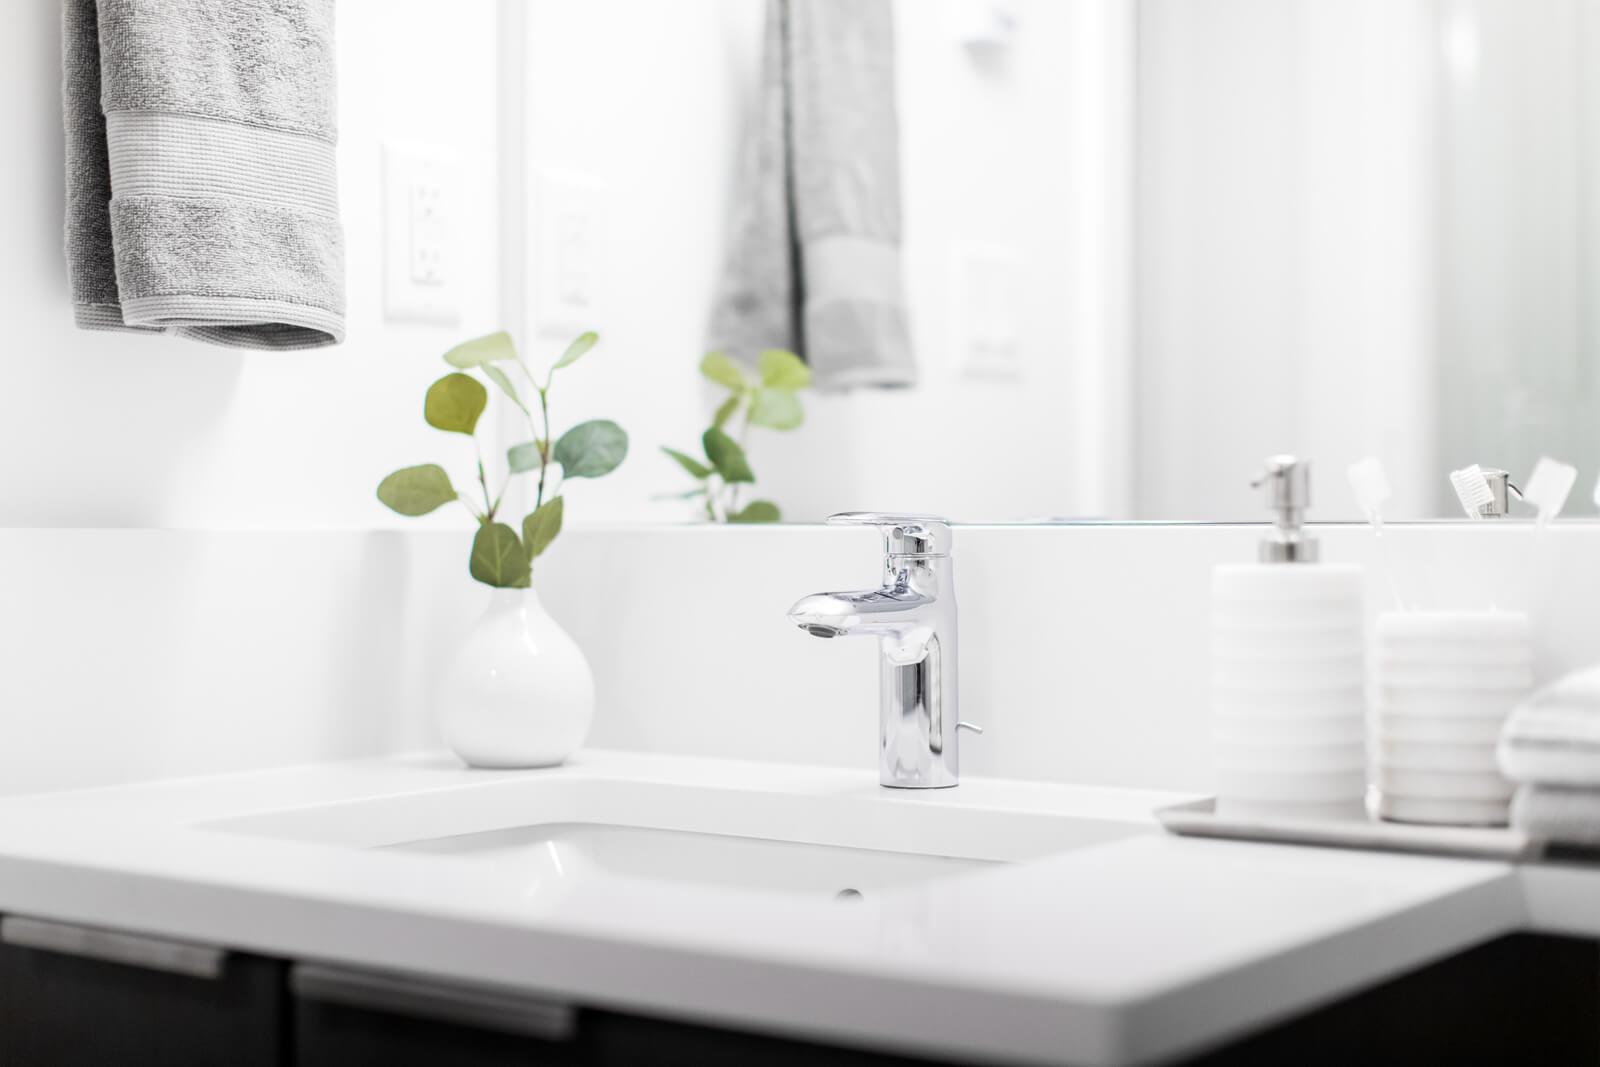 https://mk0highpointeaf8ie02.kinstacdn.com/wp-content/uploads/2019/07/Bathroom.jpg